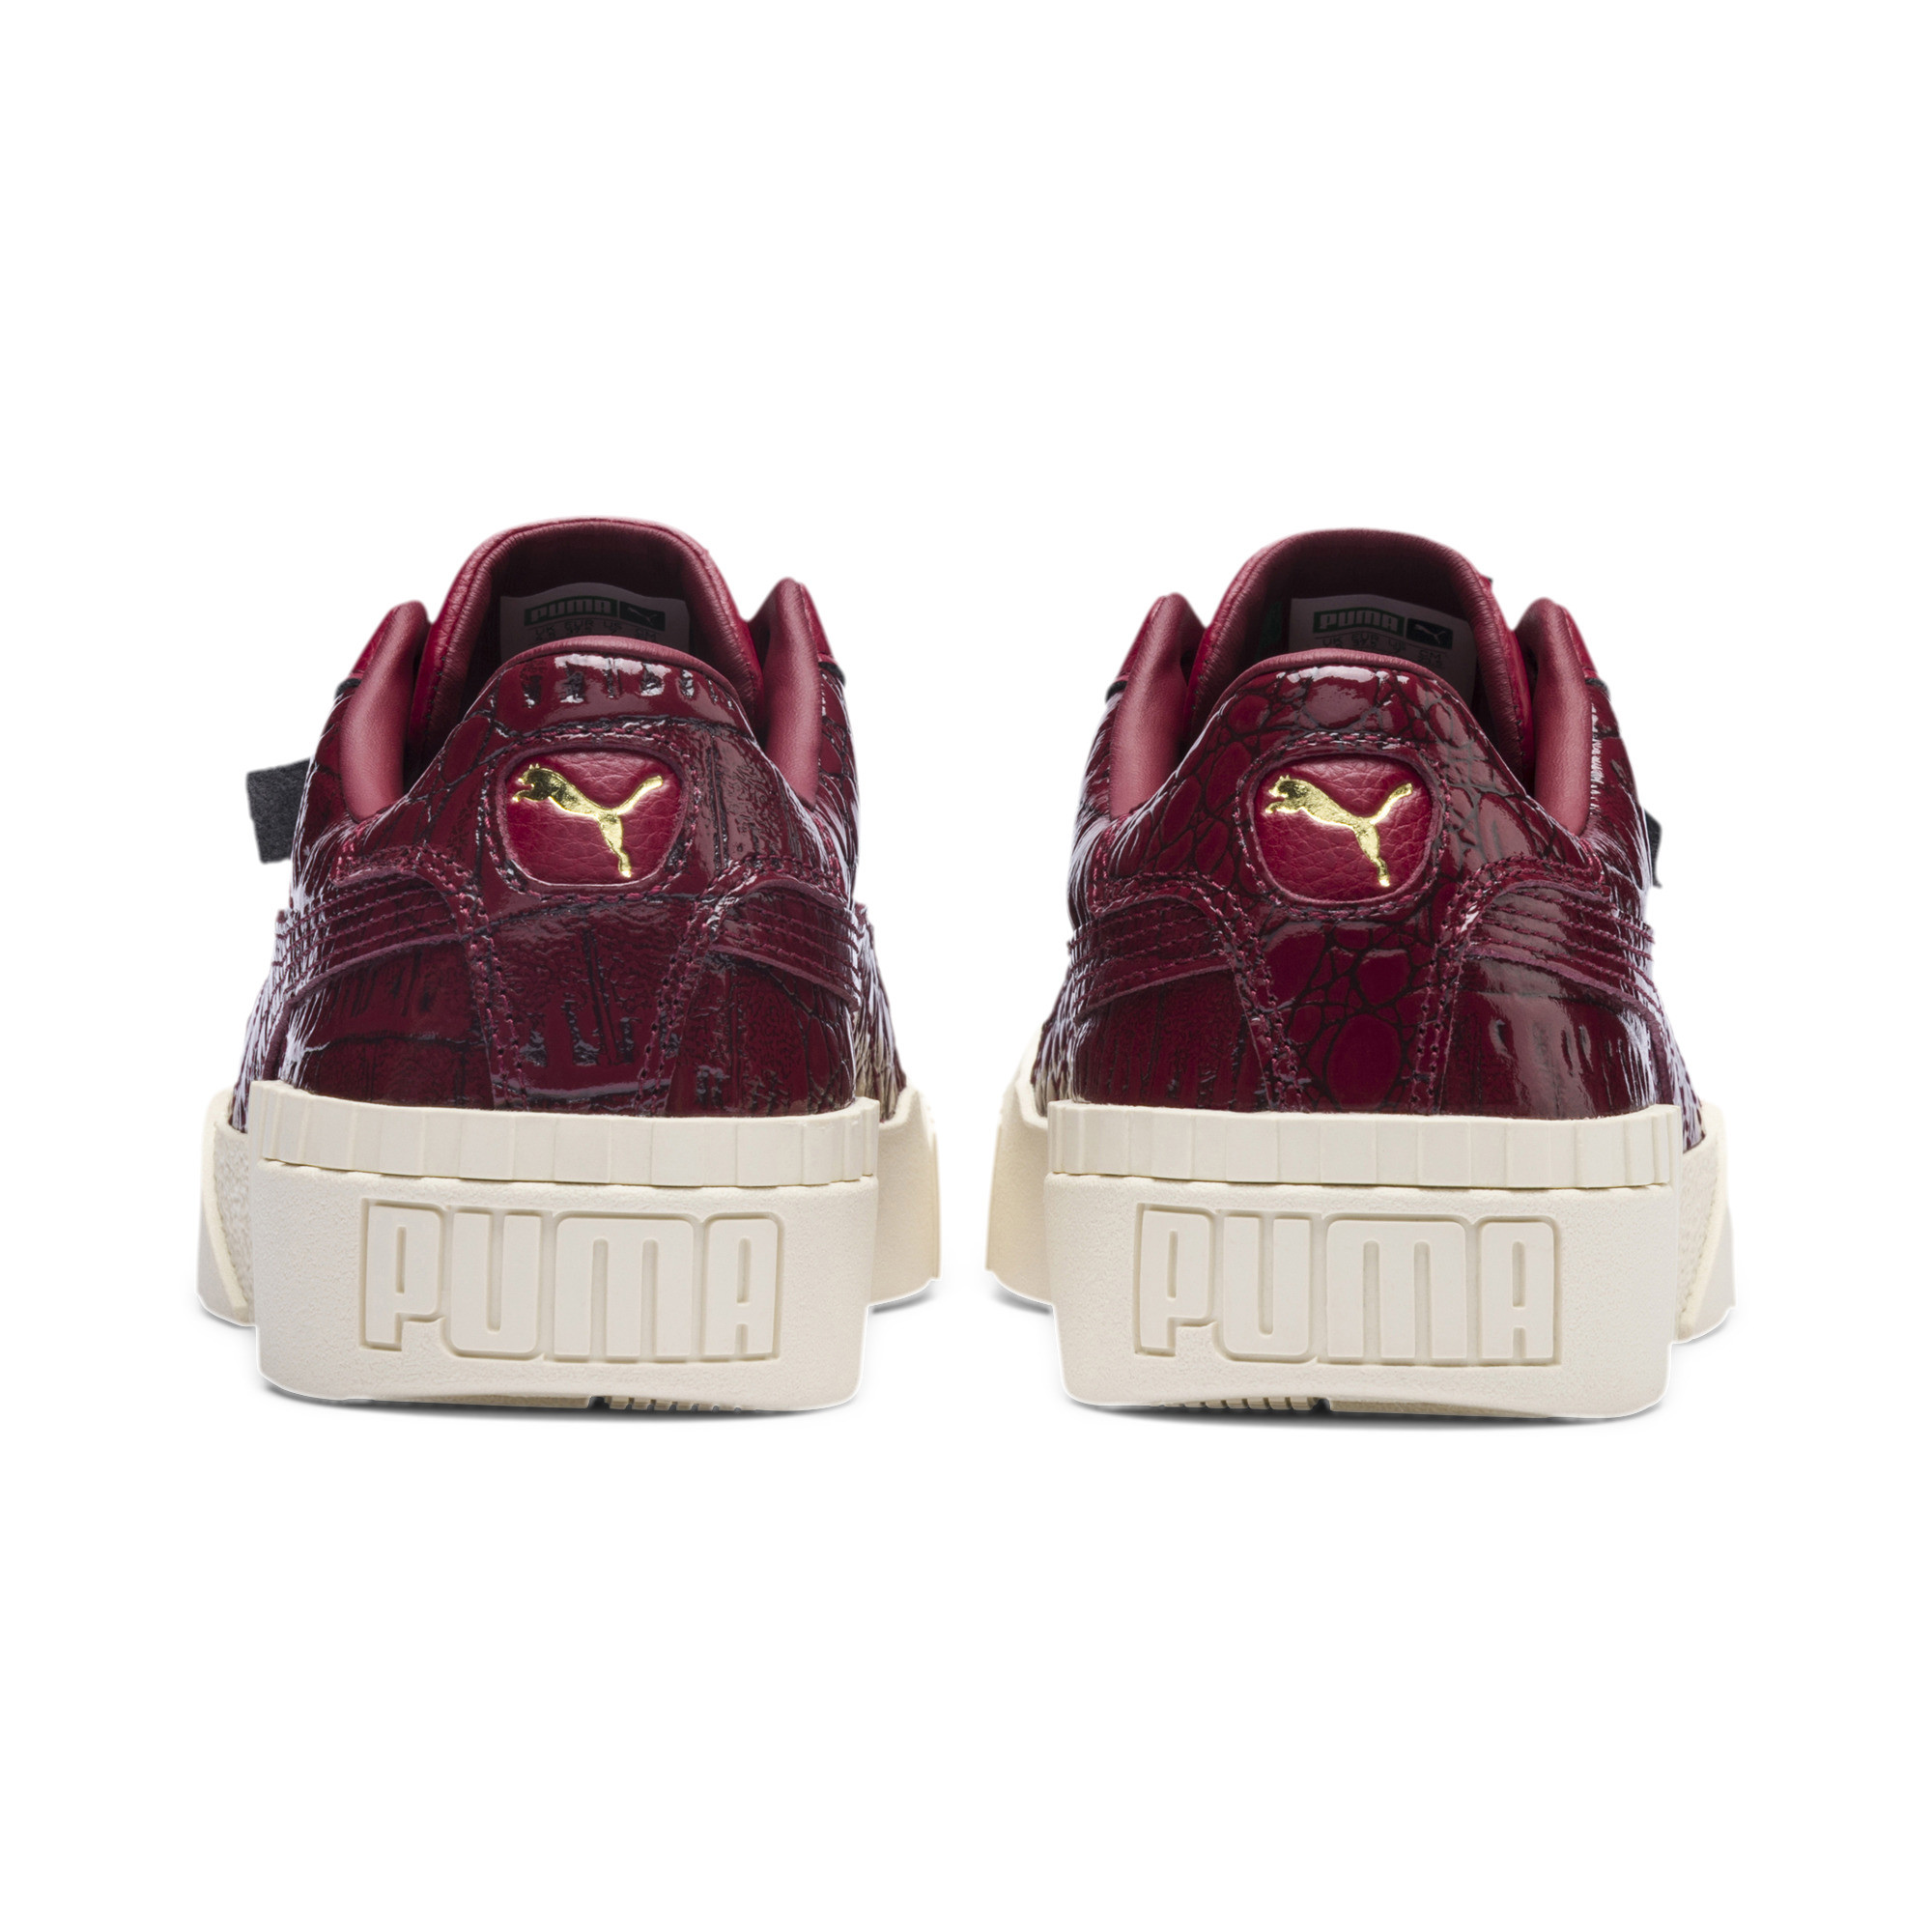 Image Puma Cali Croc Women's Sneakers #4